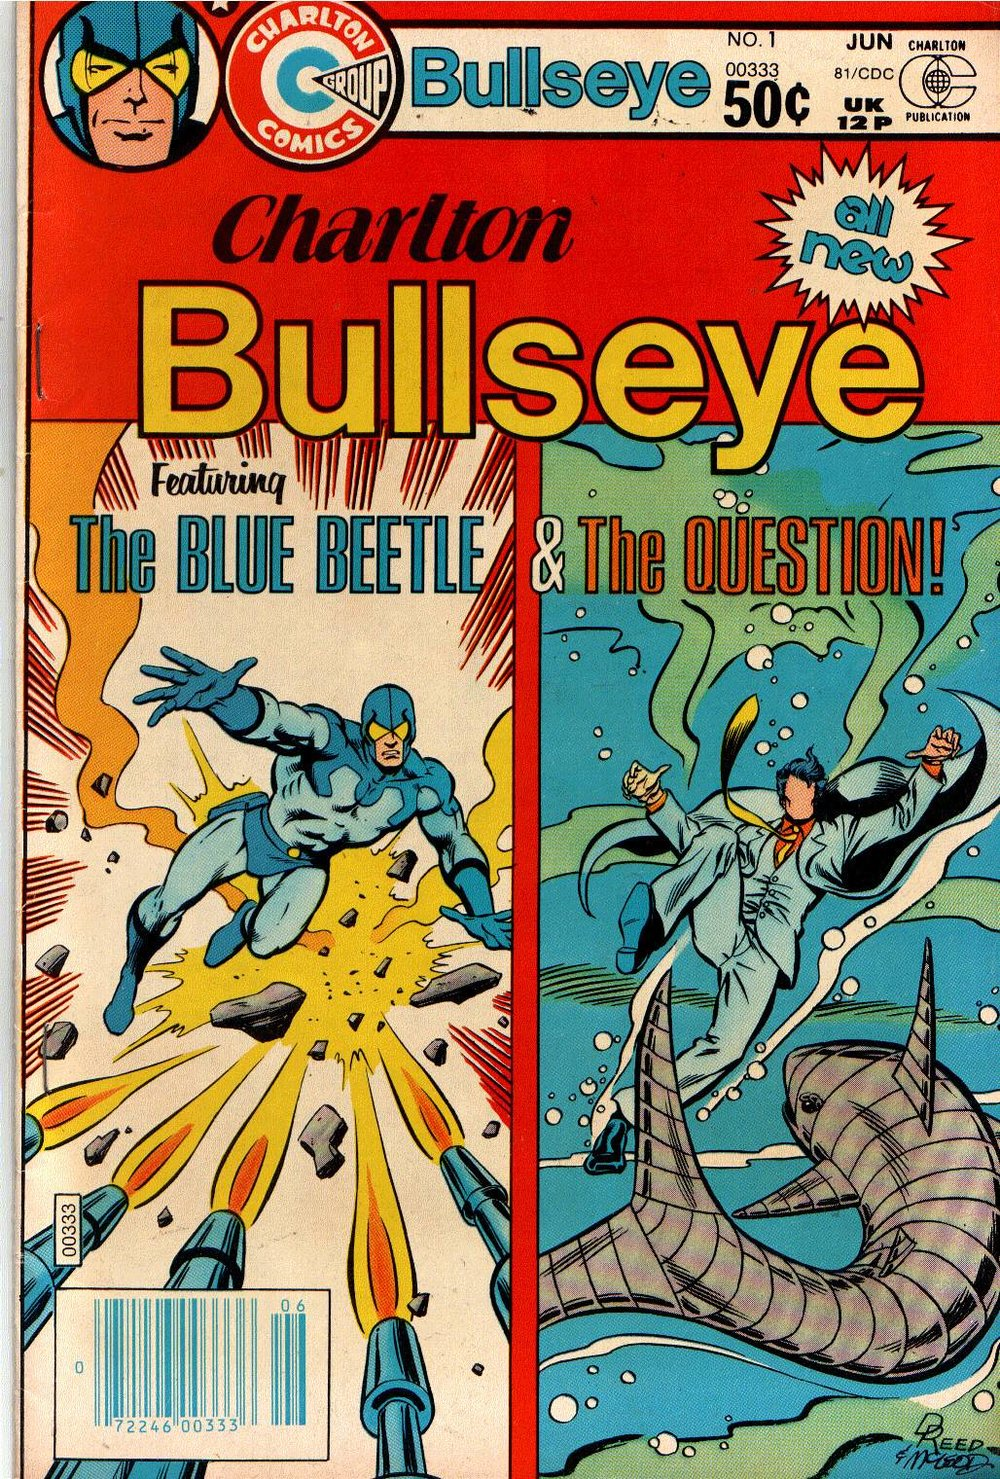 Charlton Bullseye (1981) #1, cover penciled by Dan Reed & inked by Bob McLeod.